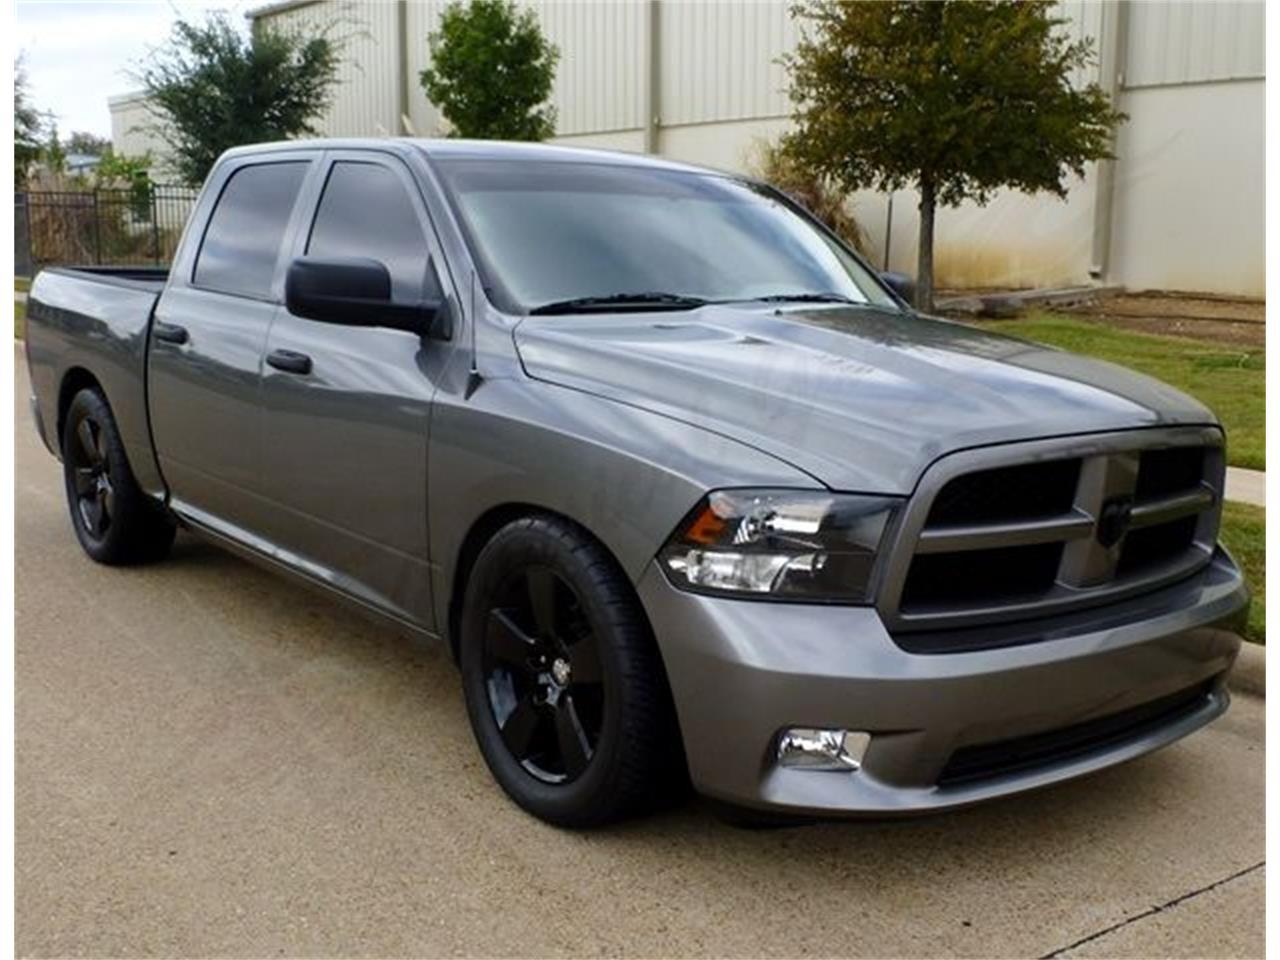 ram dodge 1500 texas classic arlington cc similar inspection temp financing insurance transport classiccars